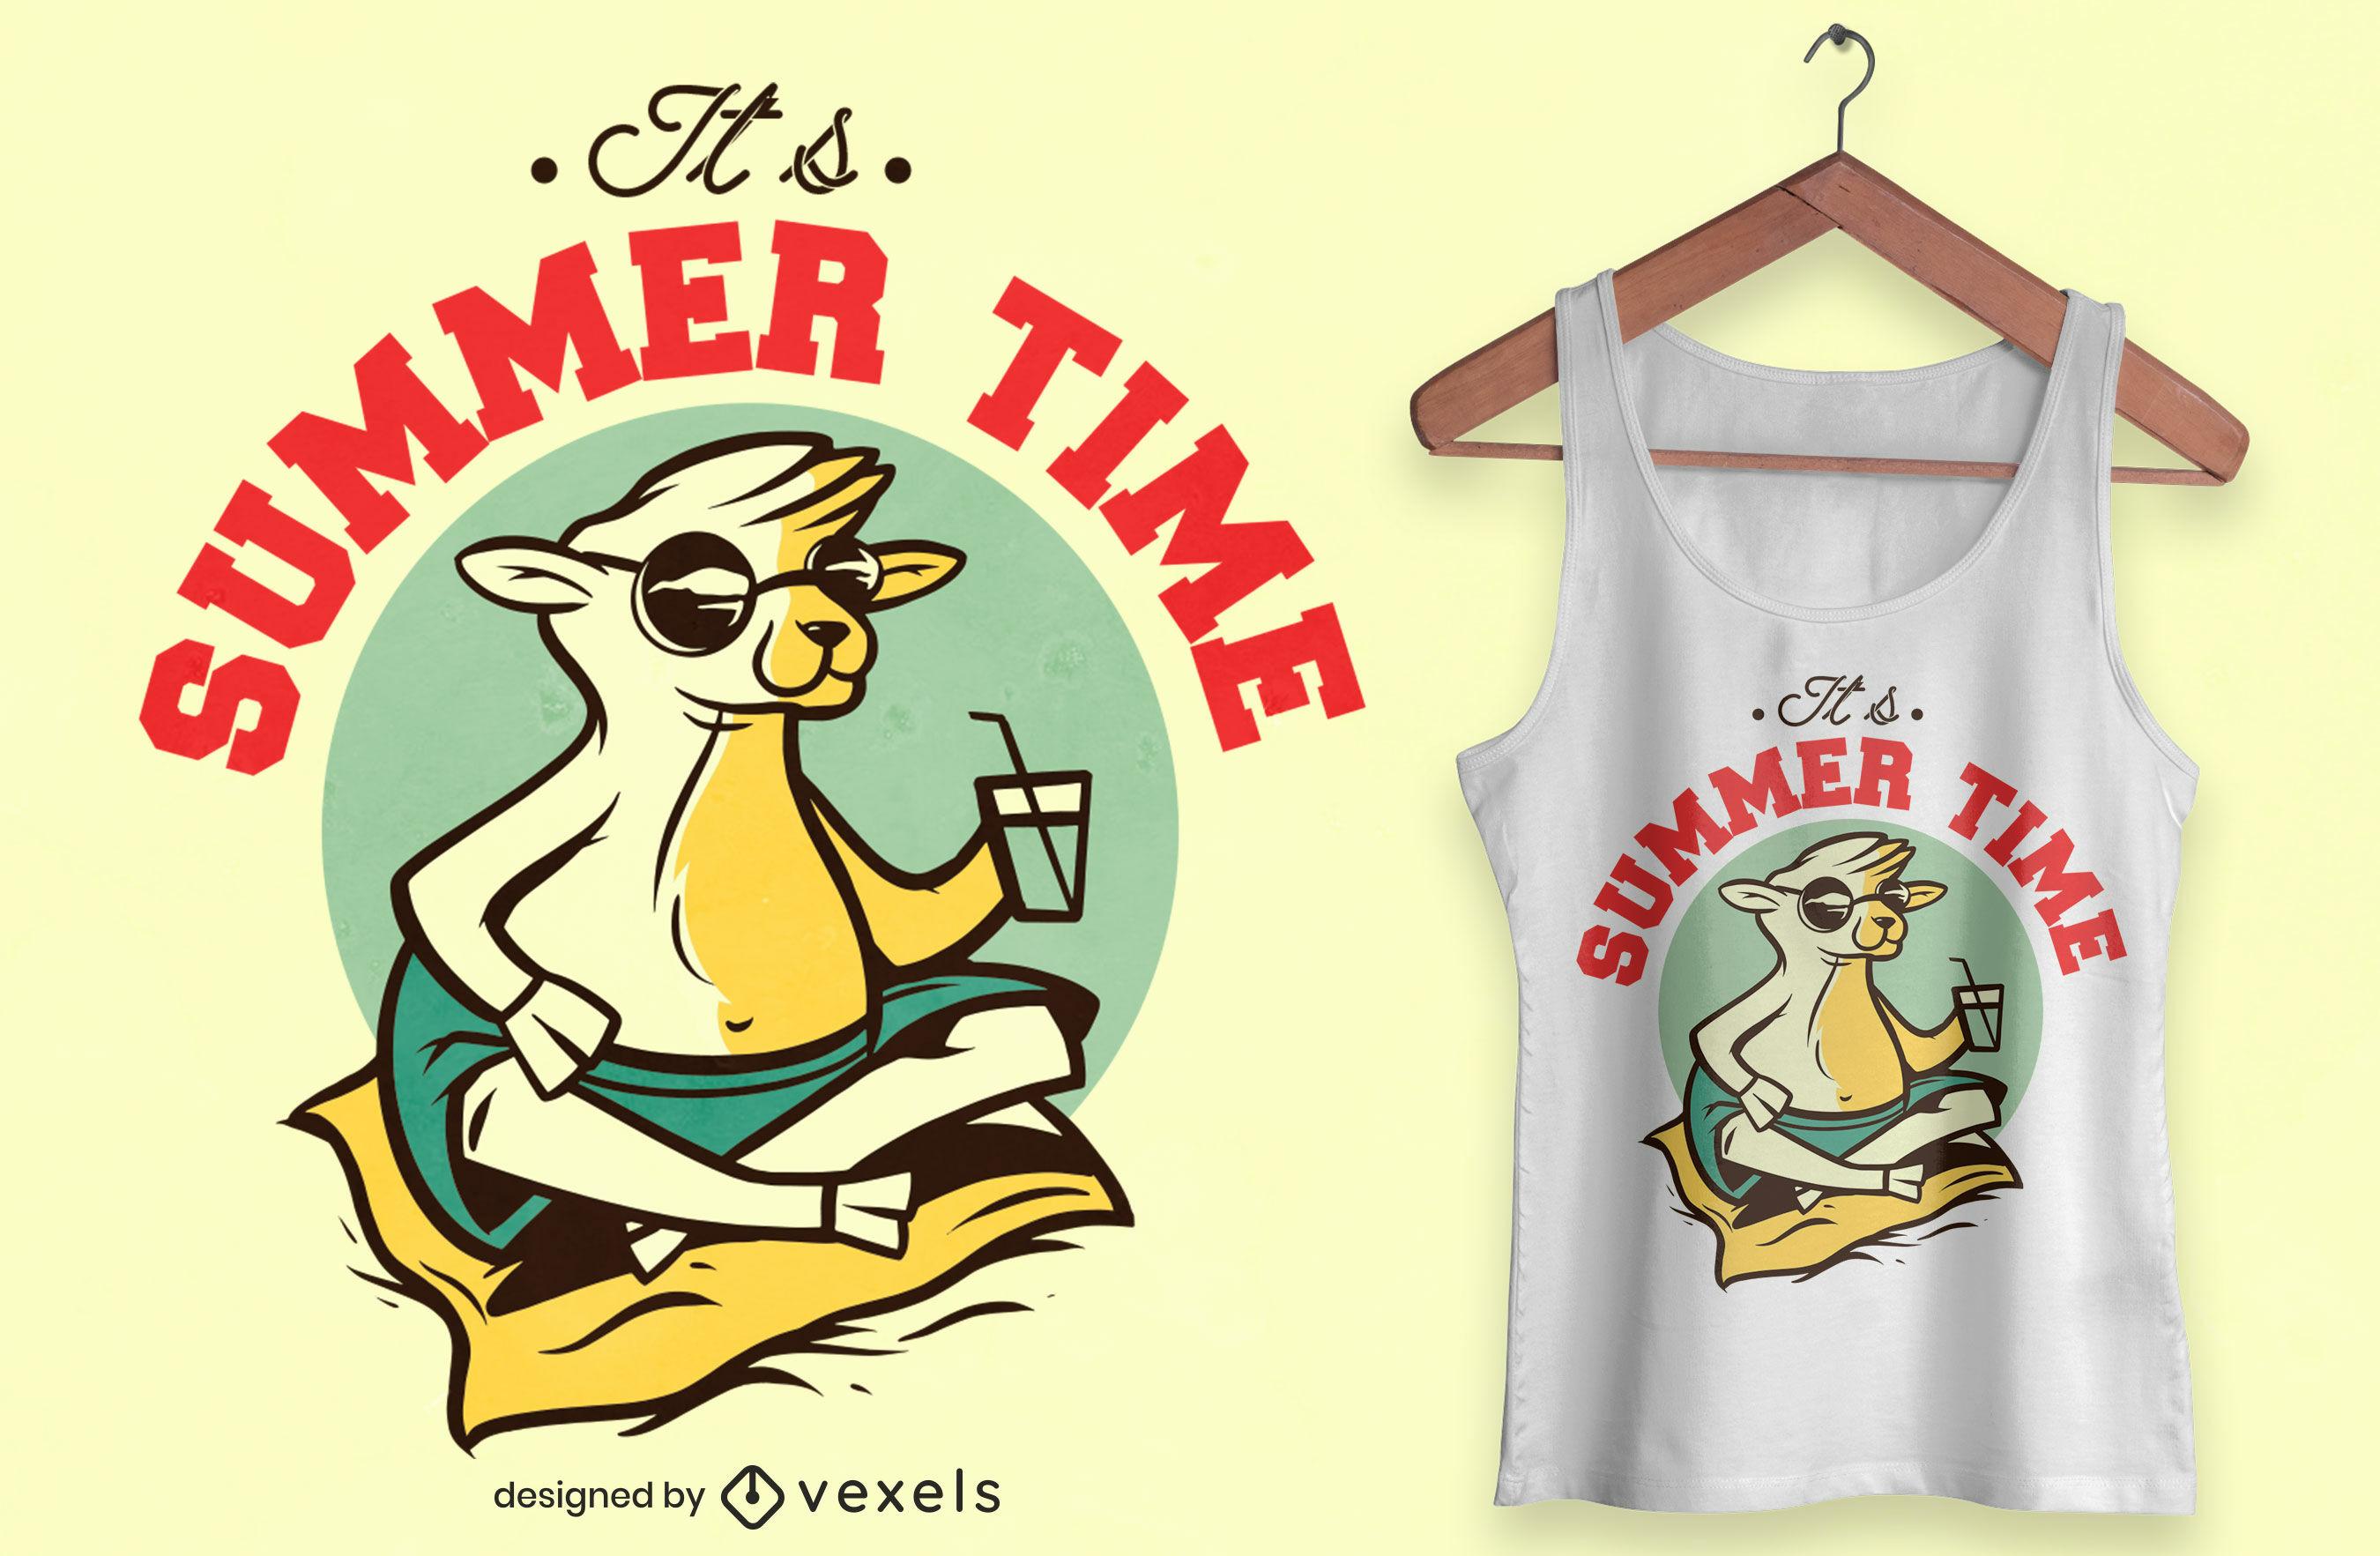 Sommerzeit cooles Schaf T-Shirt Design